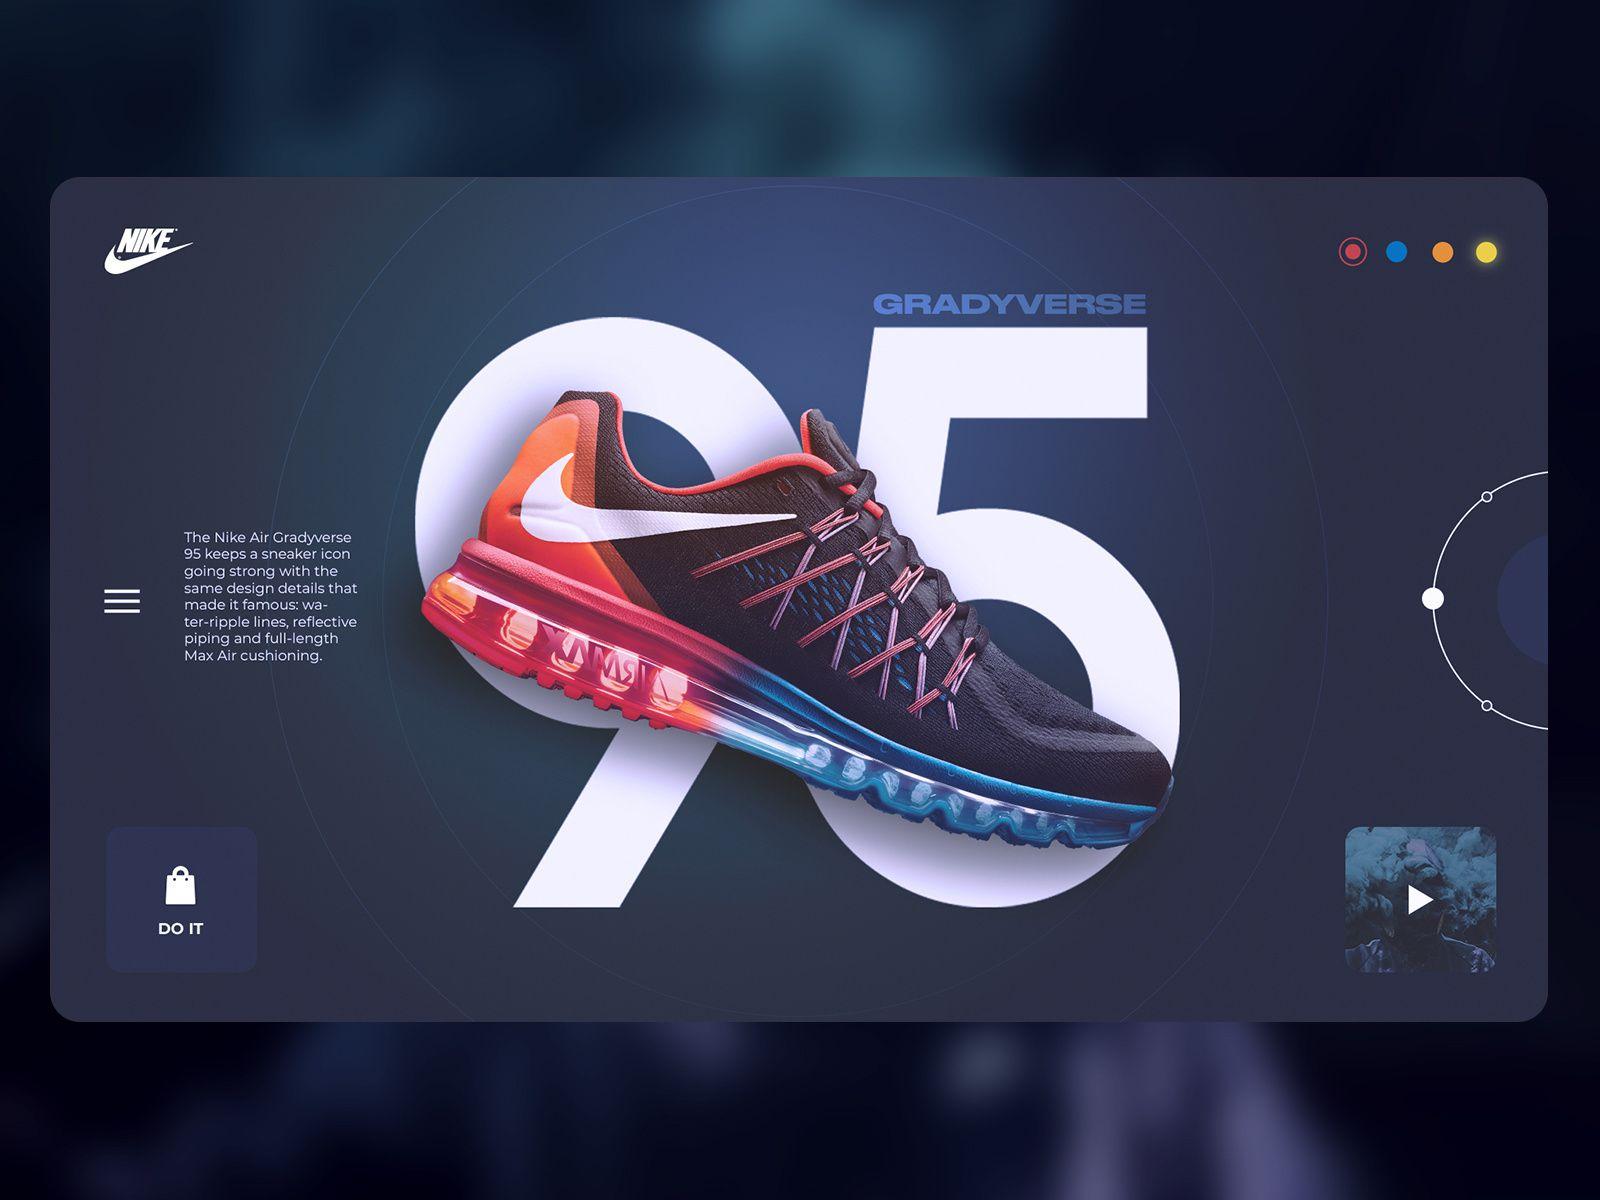 mosquito balcón sexo  Nike Air Max Gradyverse website concept in 2020   Web design tips, Banner  design layout, Web layout design